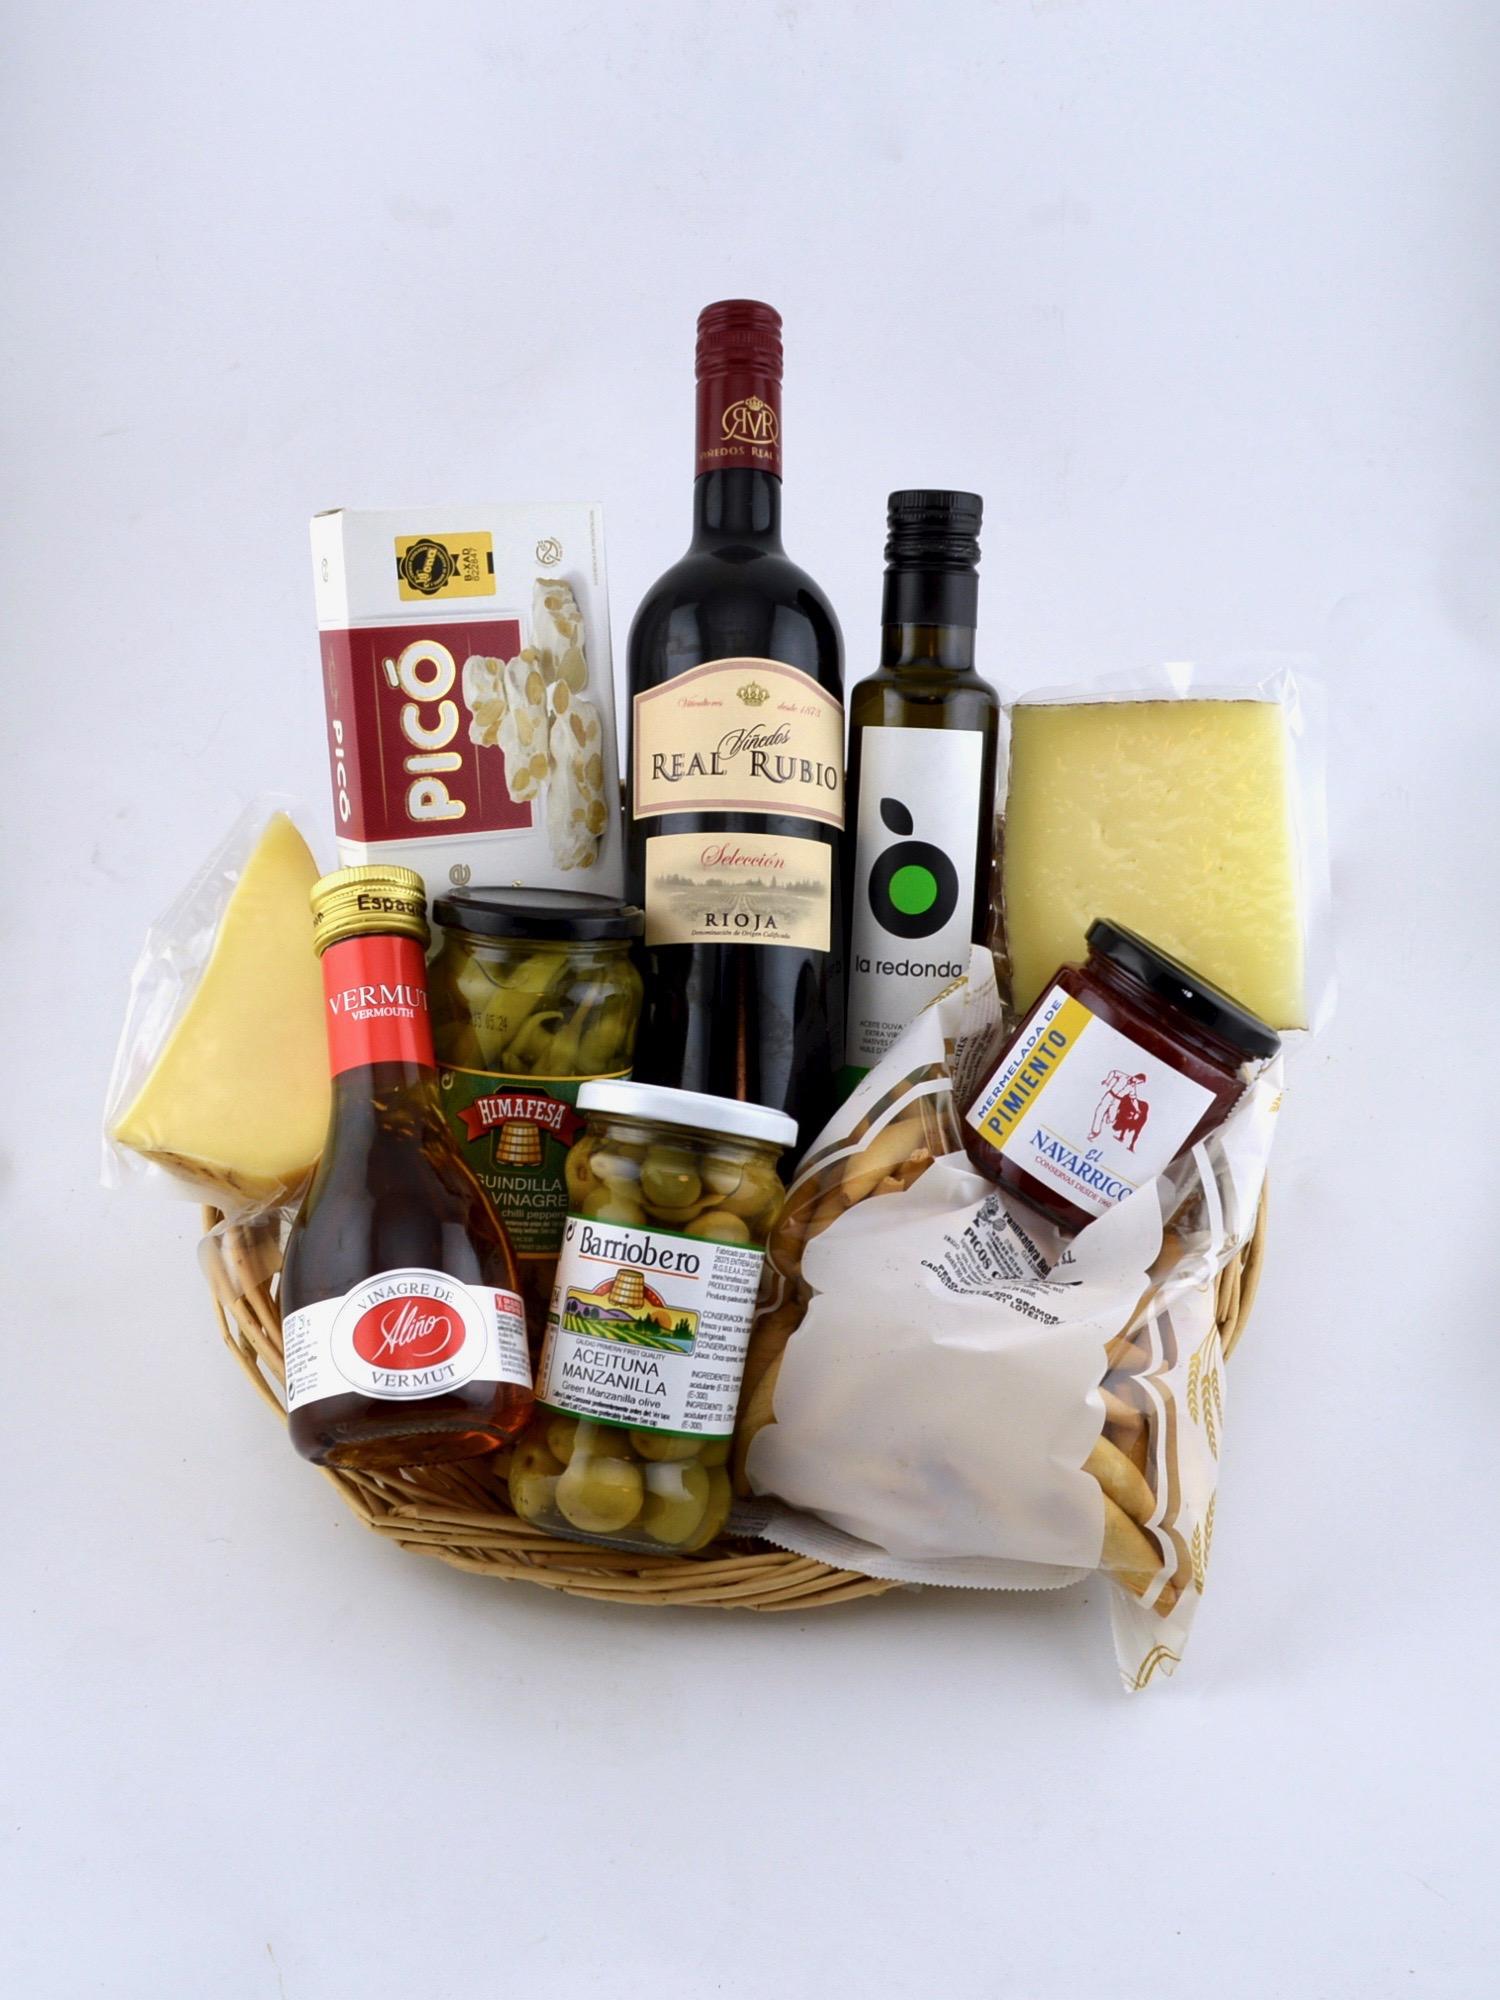 Pacomer Traiteur kerstpakket vegetarisch